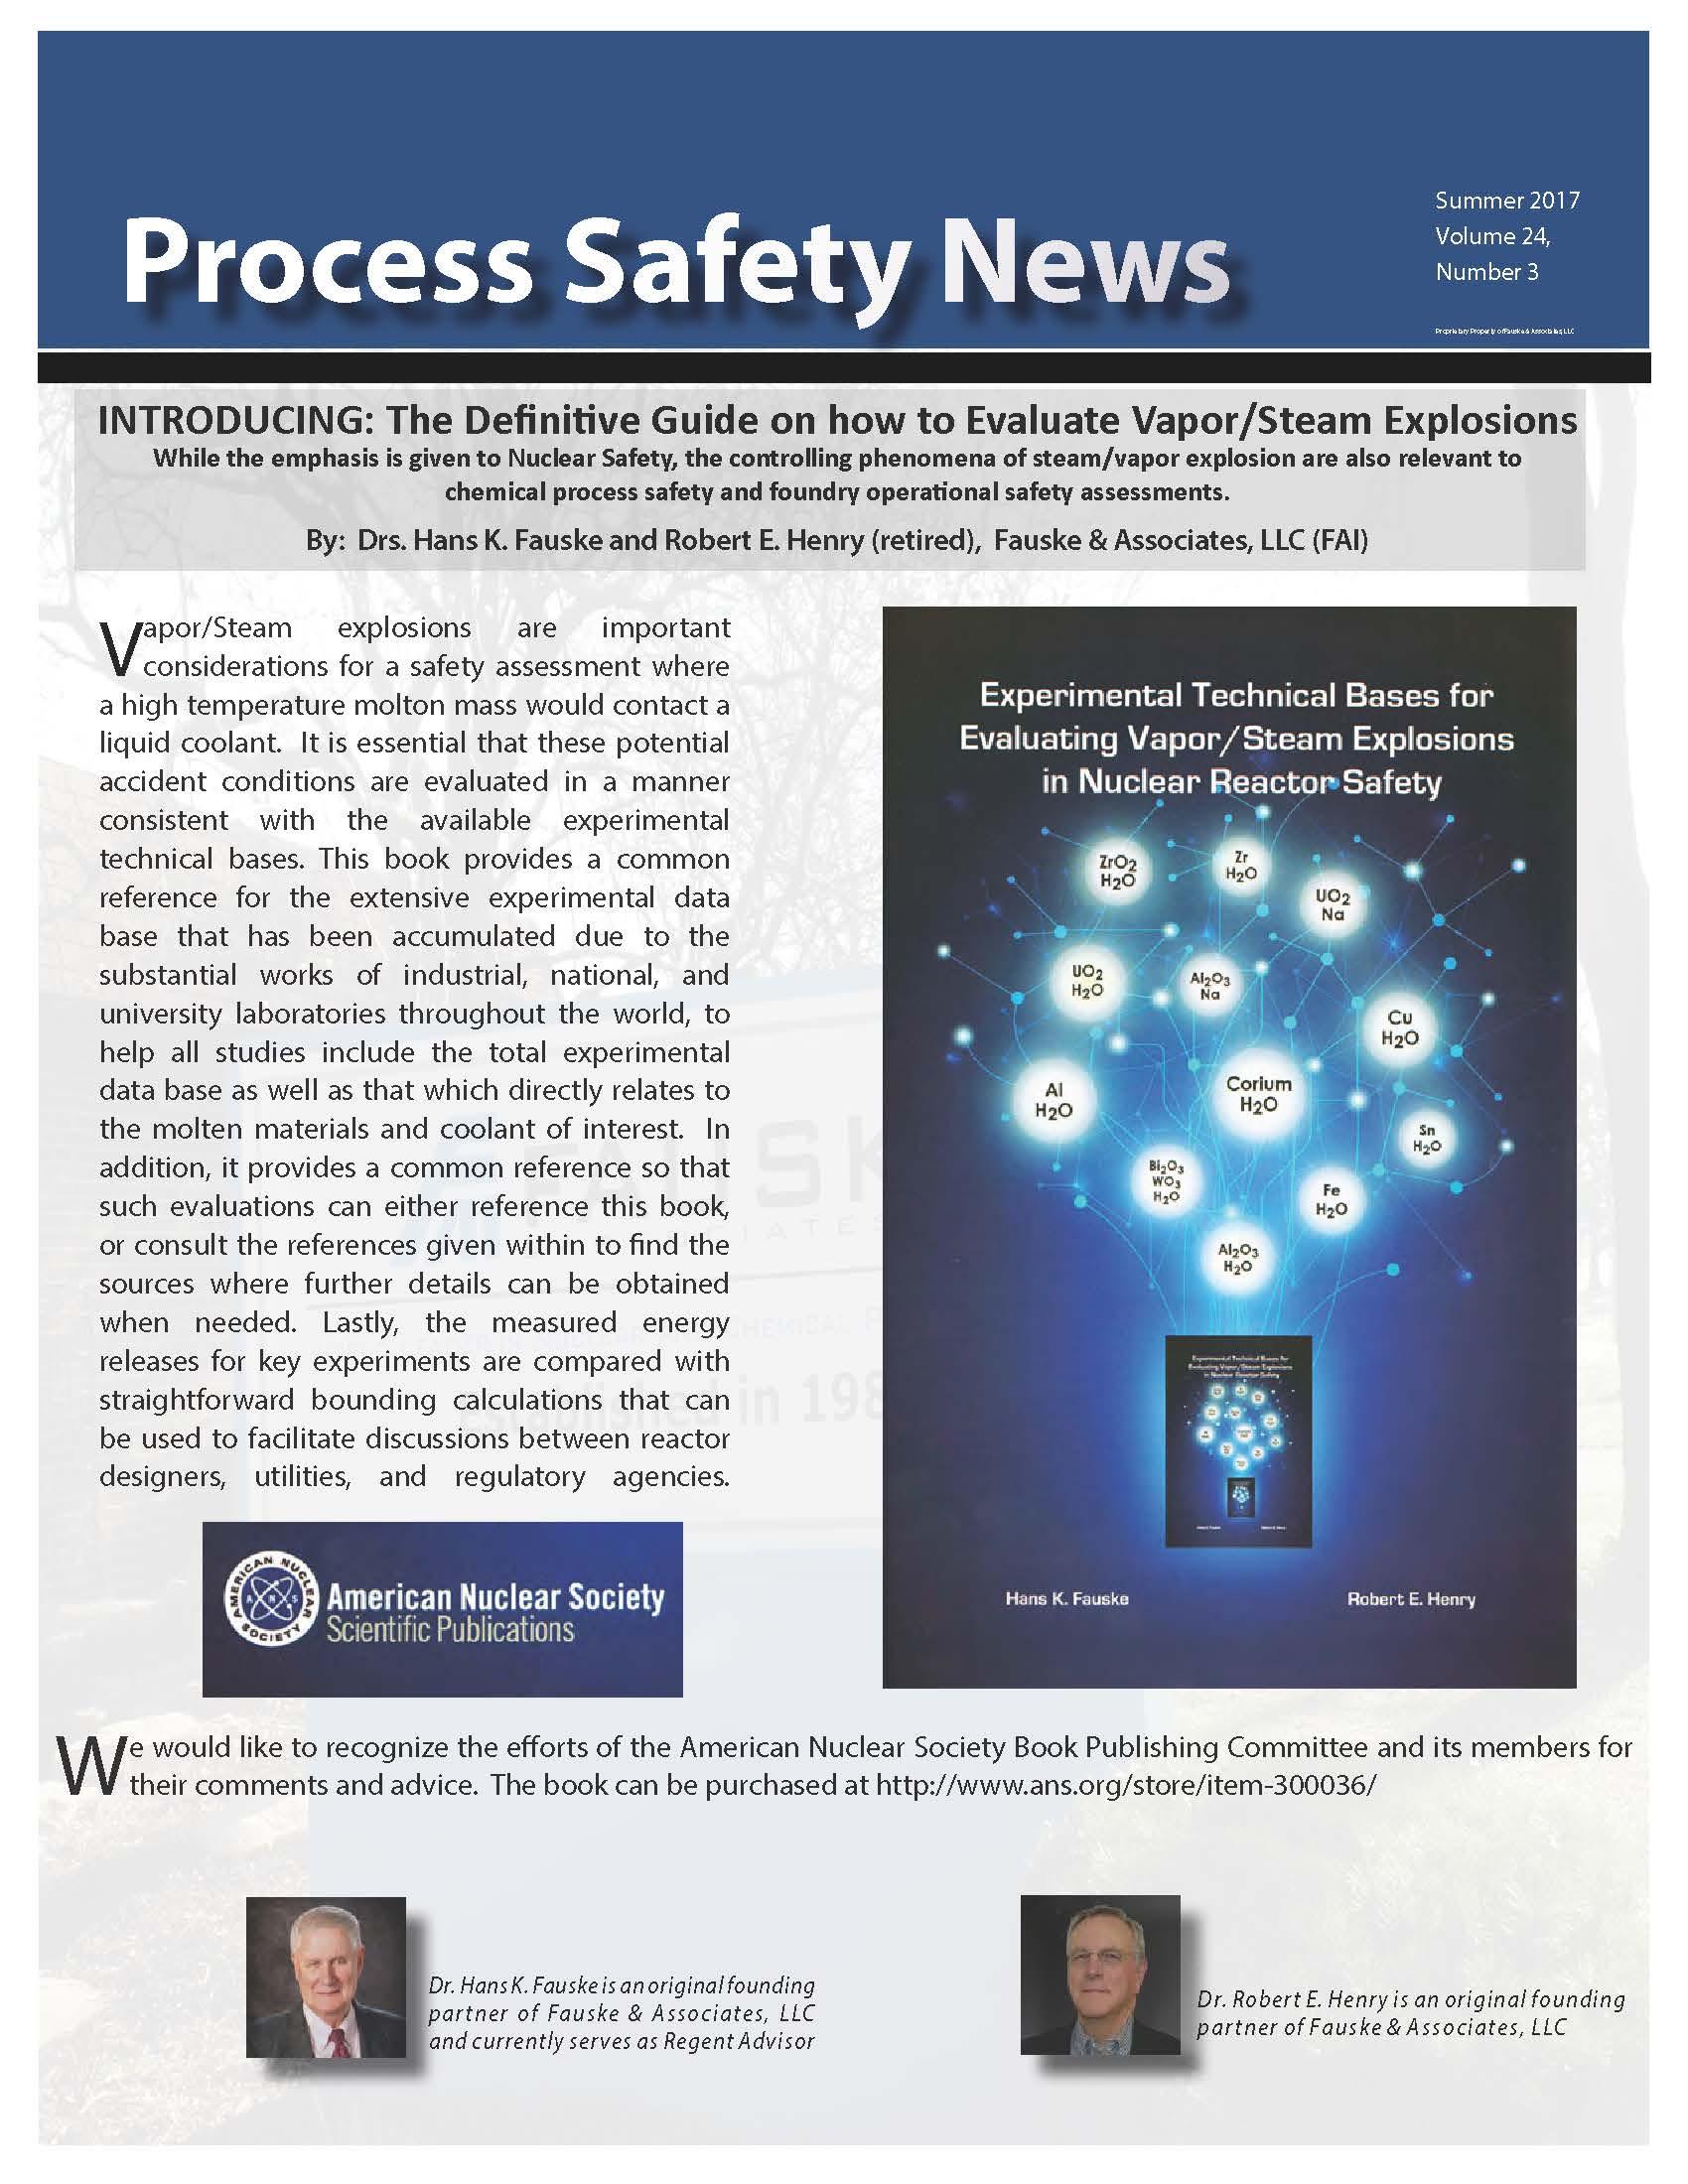 Summer 2017 Process Safety Newsletter